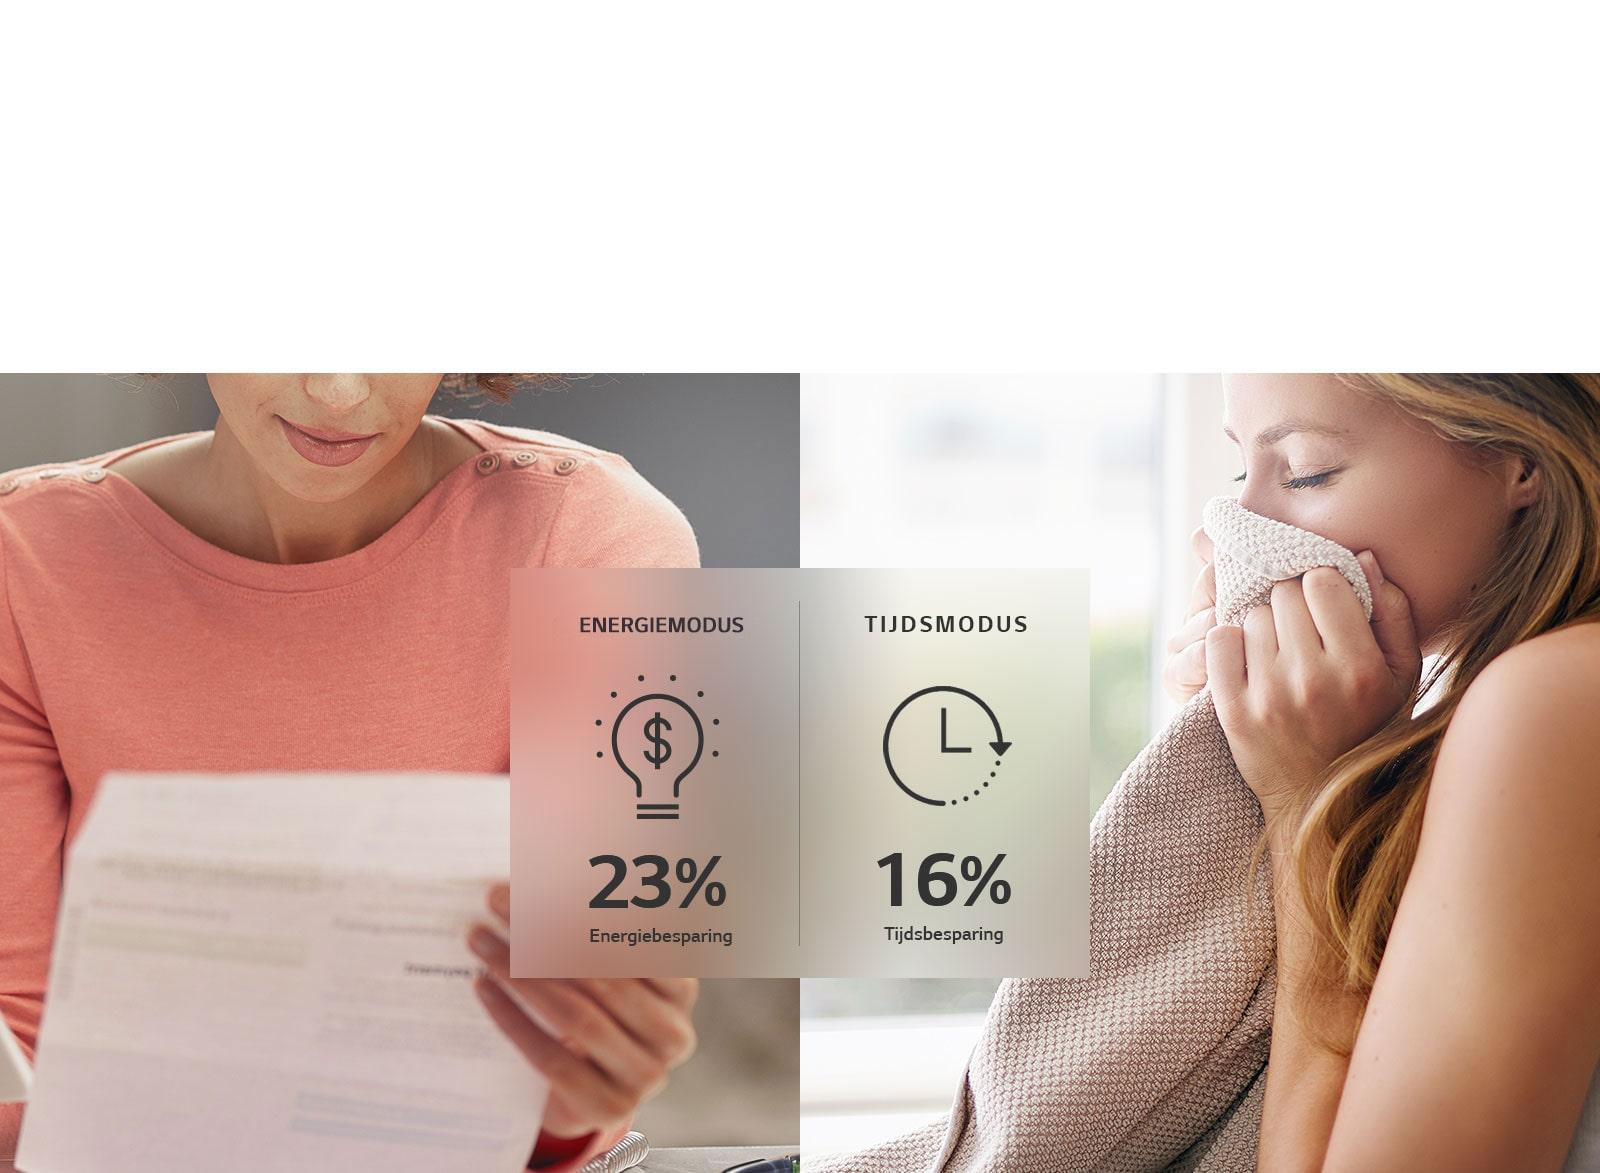 Bespaar energie of bespaar tijd1